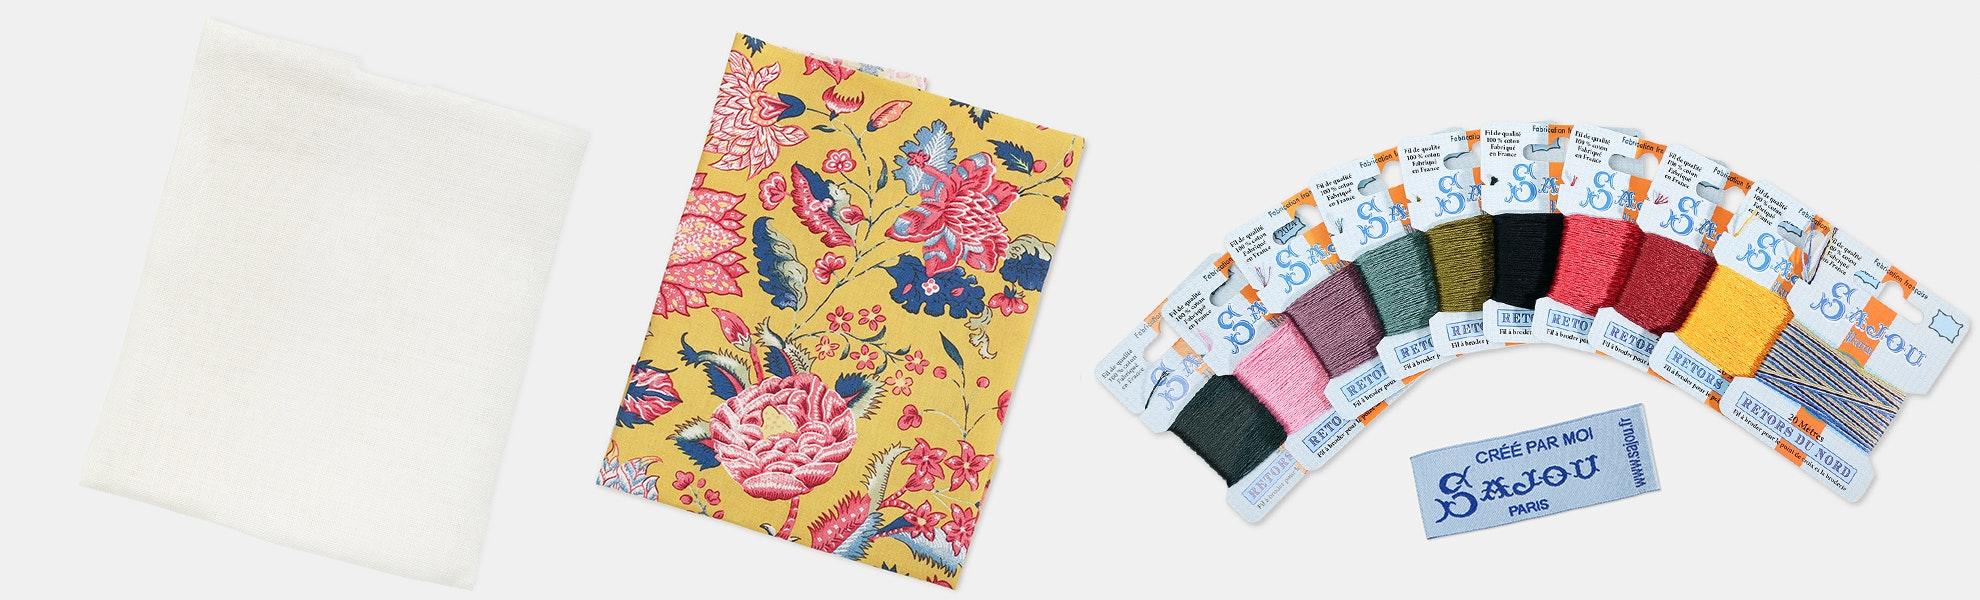 Complete Cross-Stitch Kit by Maison Sajou